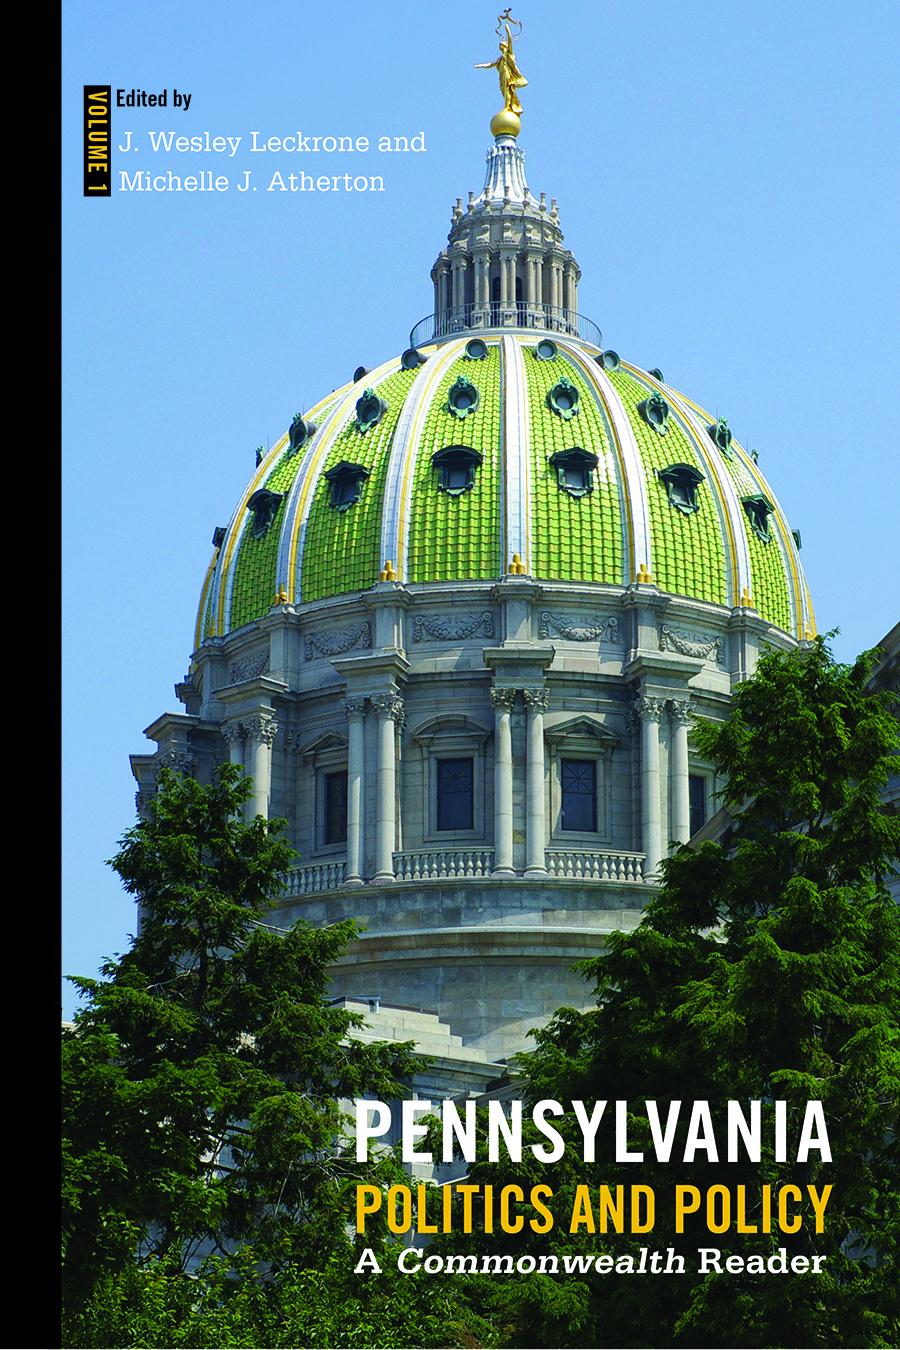 Pennsylvania Politics and Policy_sm.jpg